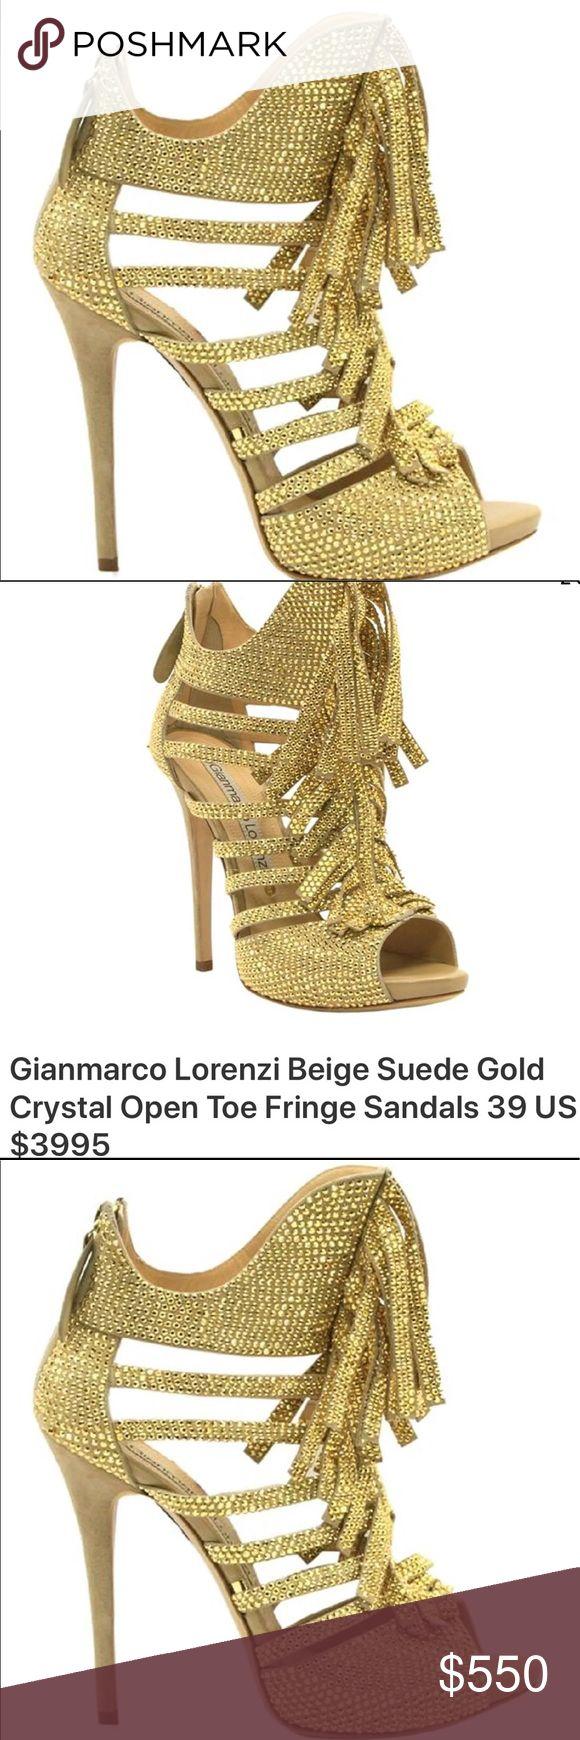 Lorenzo Stiletto shoe High end quality Gianmarco Lorenzo crystal studded sandals gold lorenzi Shoes Sandals